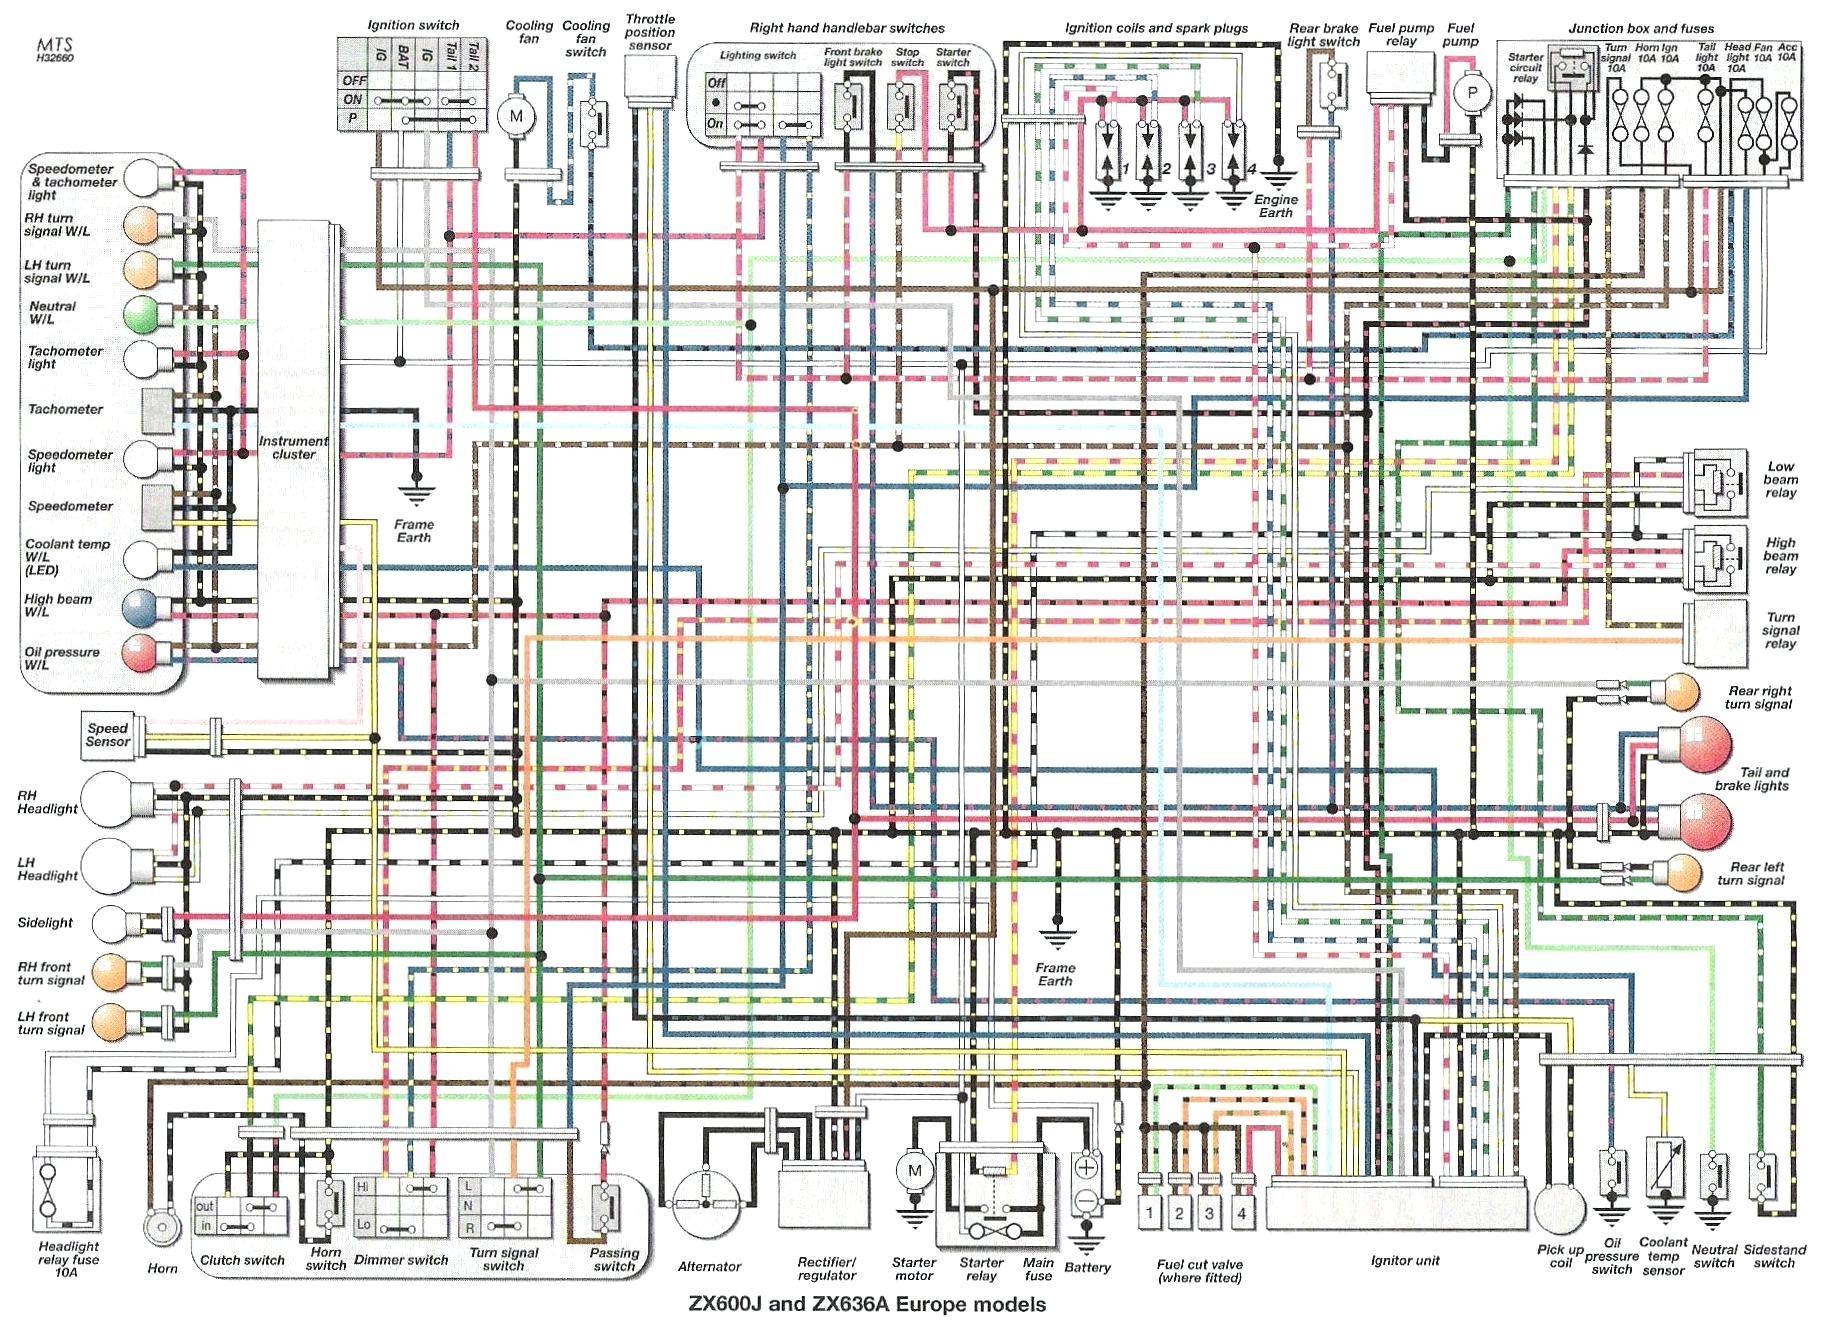 inspiration yamaha r1 wiring diagram irelandnews co picturesque 2002 jpg